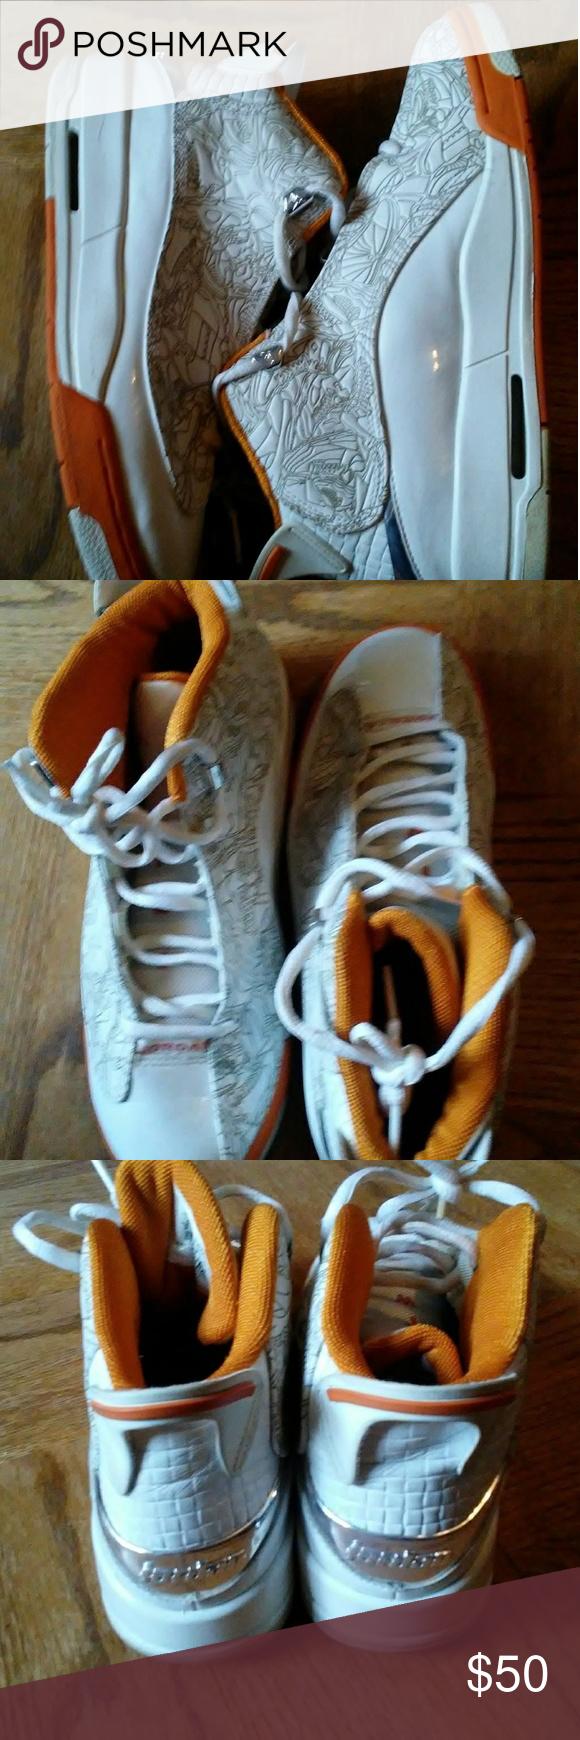 c1dae18560 Nike Air Jordan Dub Zero White/White-Ceramic 31104 Nike Air Jordan Dub Zero  White/White-Ceramic 311047-111 size 6y Jordan Shoes Slippers